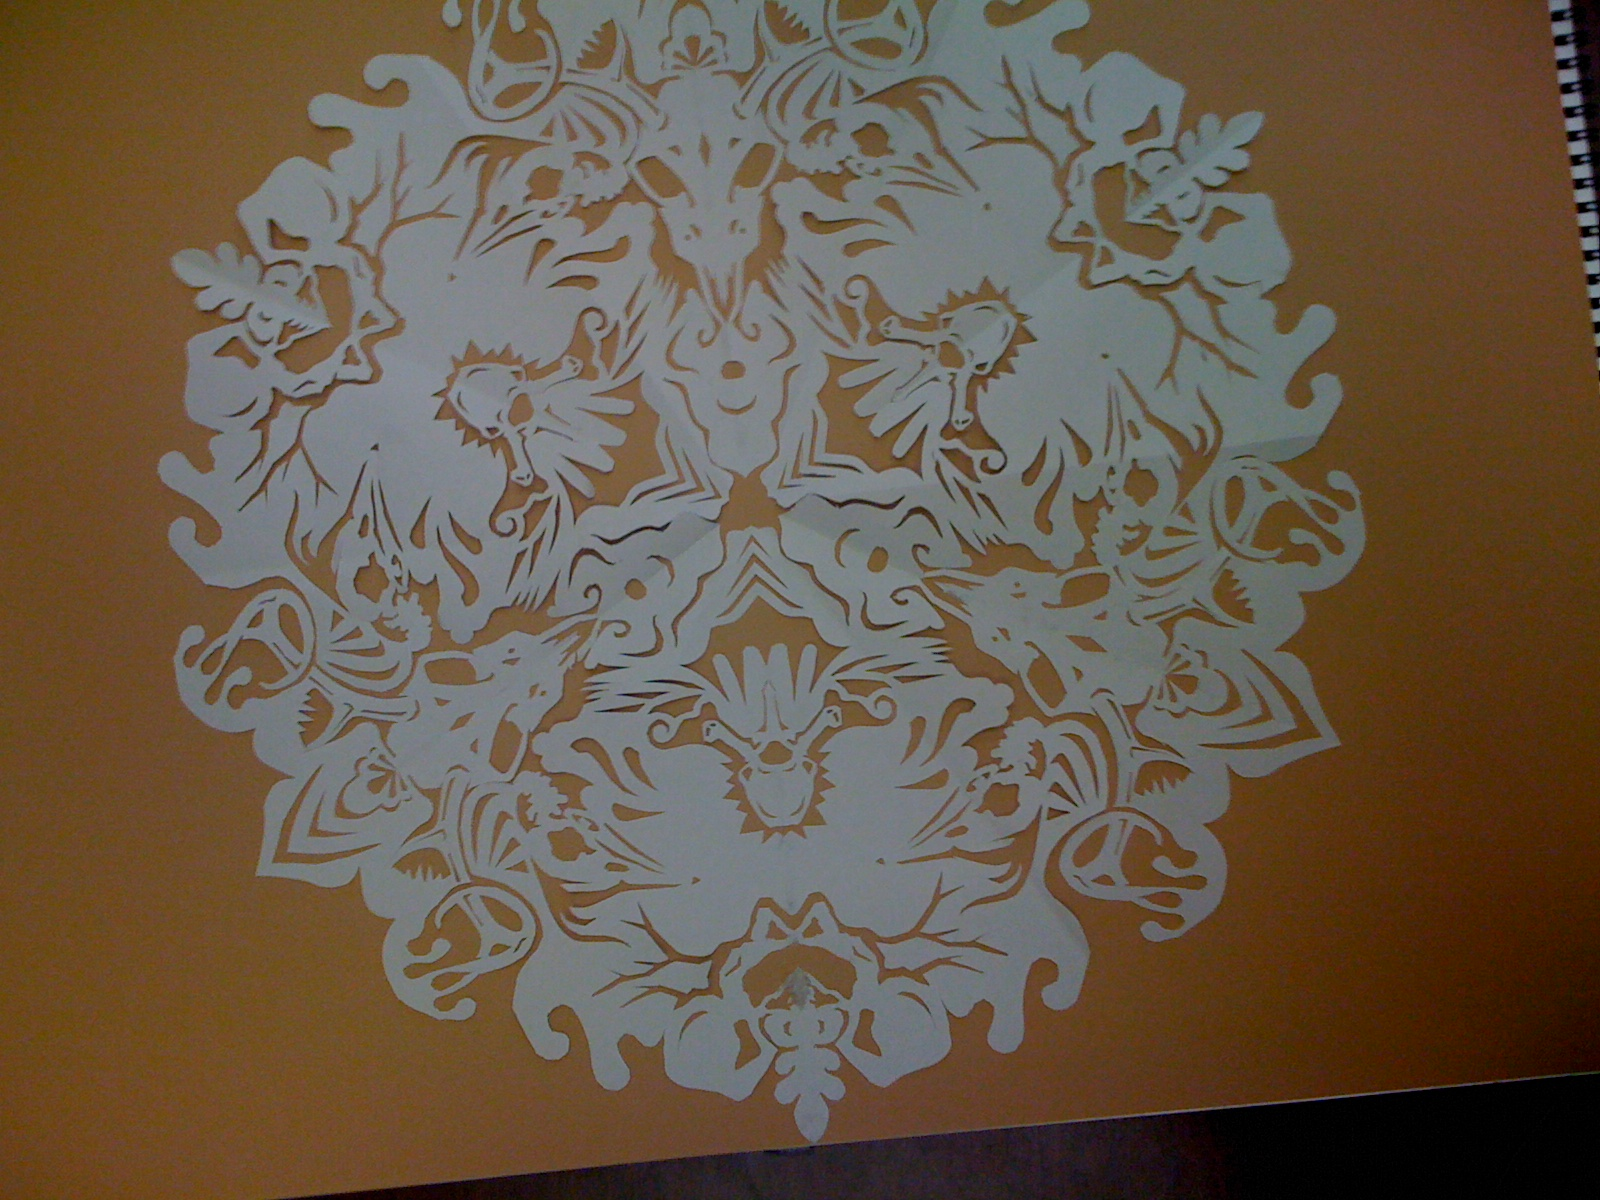 3-fold symmetry cut out